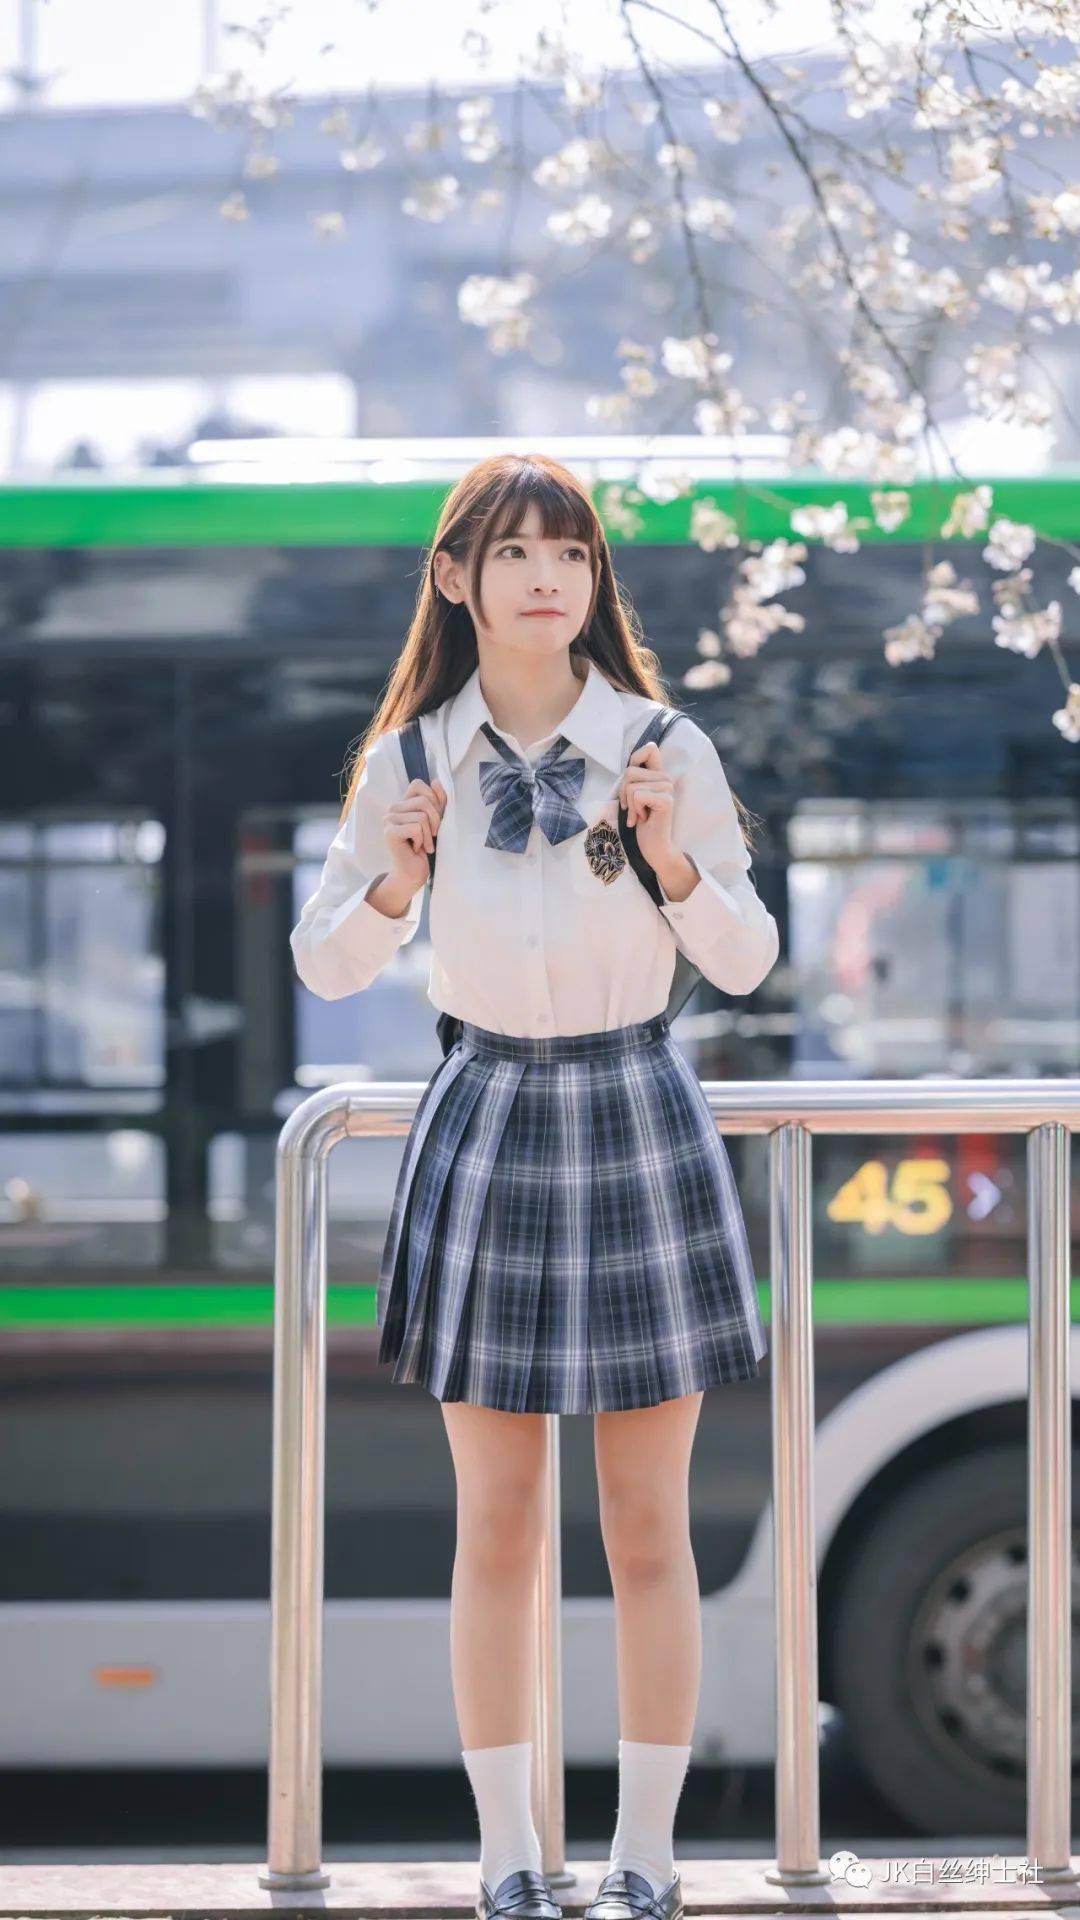 JK少女:樱花里的微笑